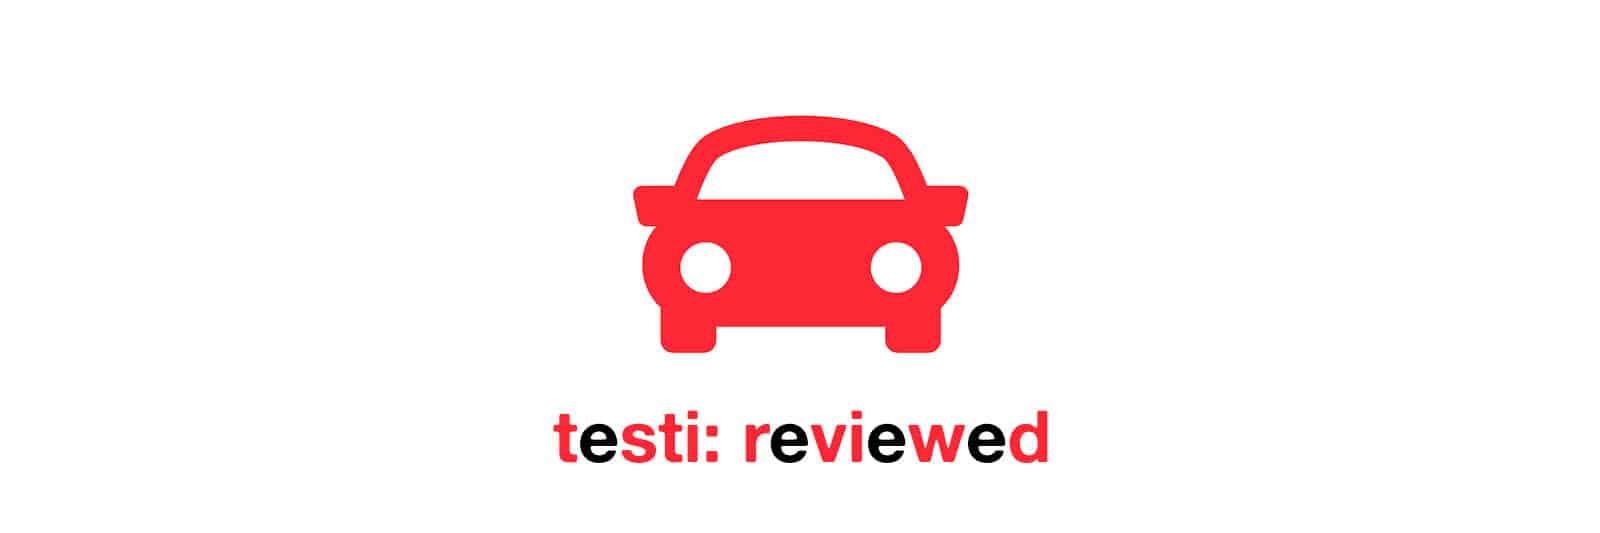 testi-reviewed